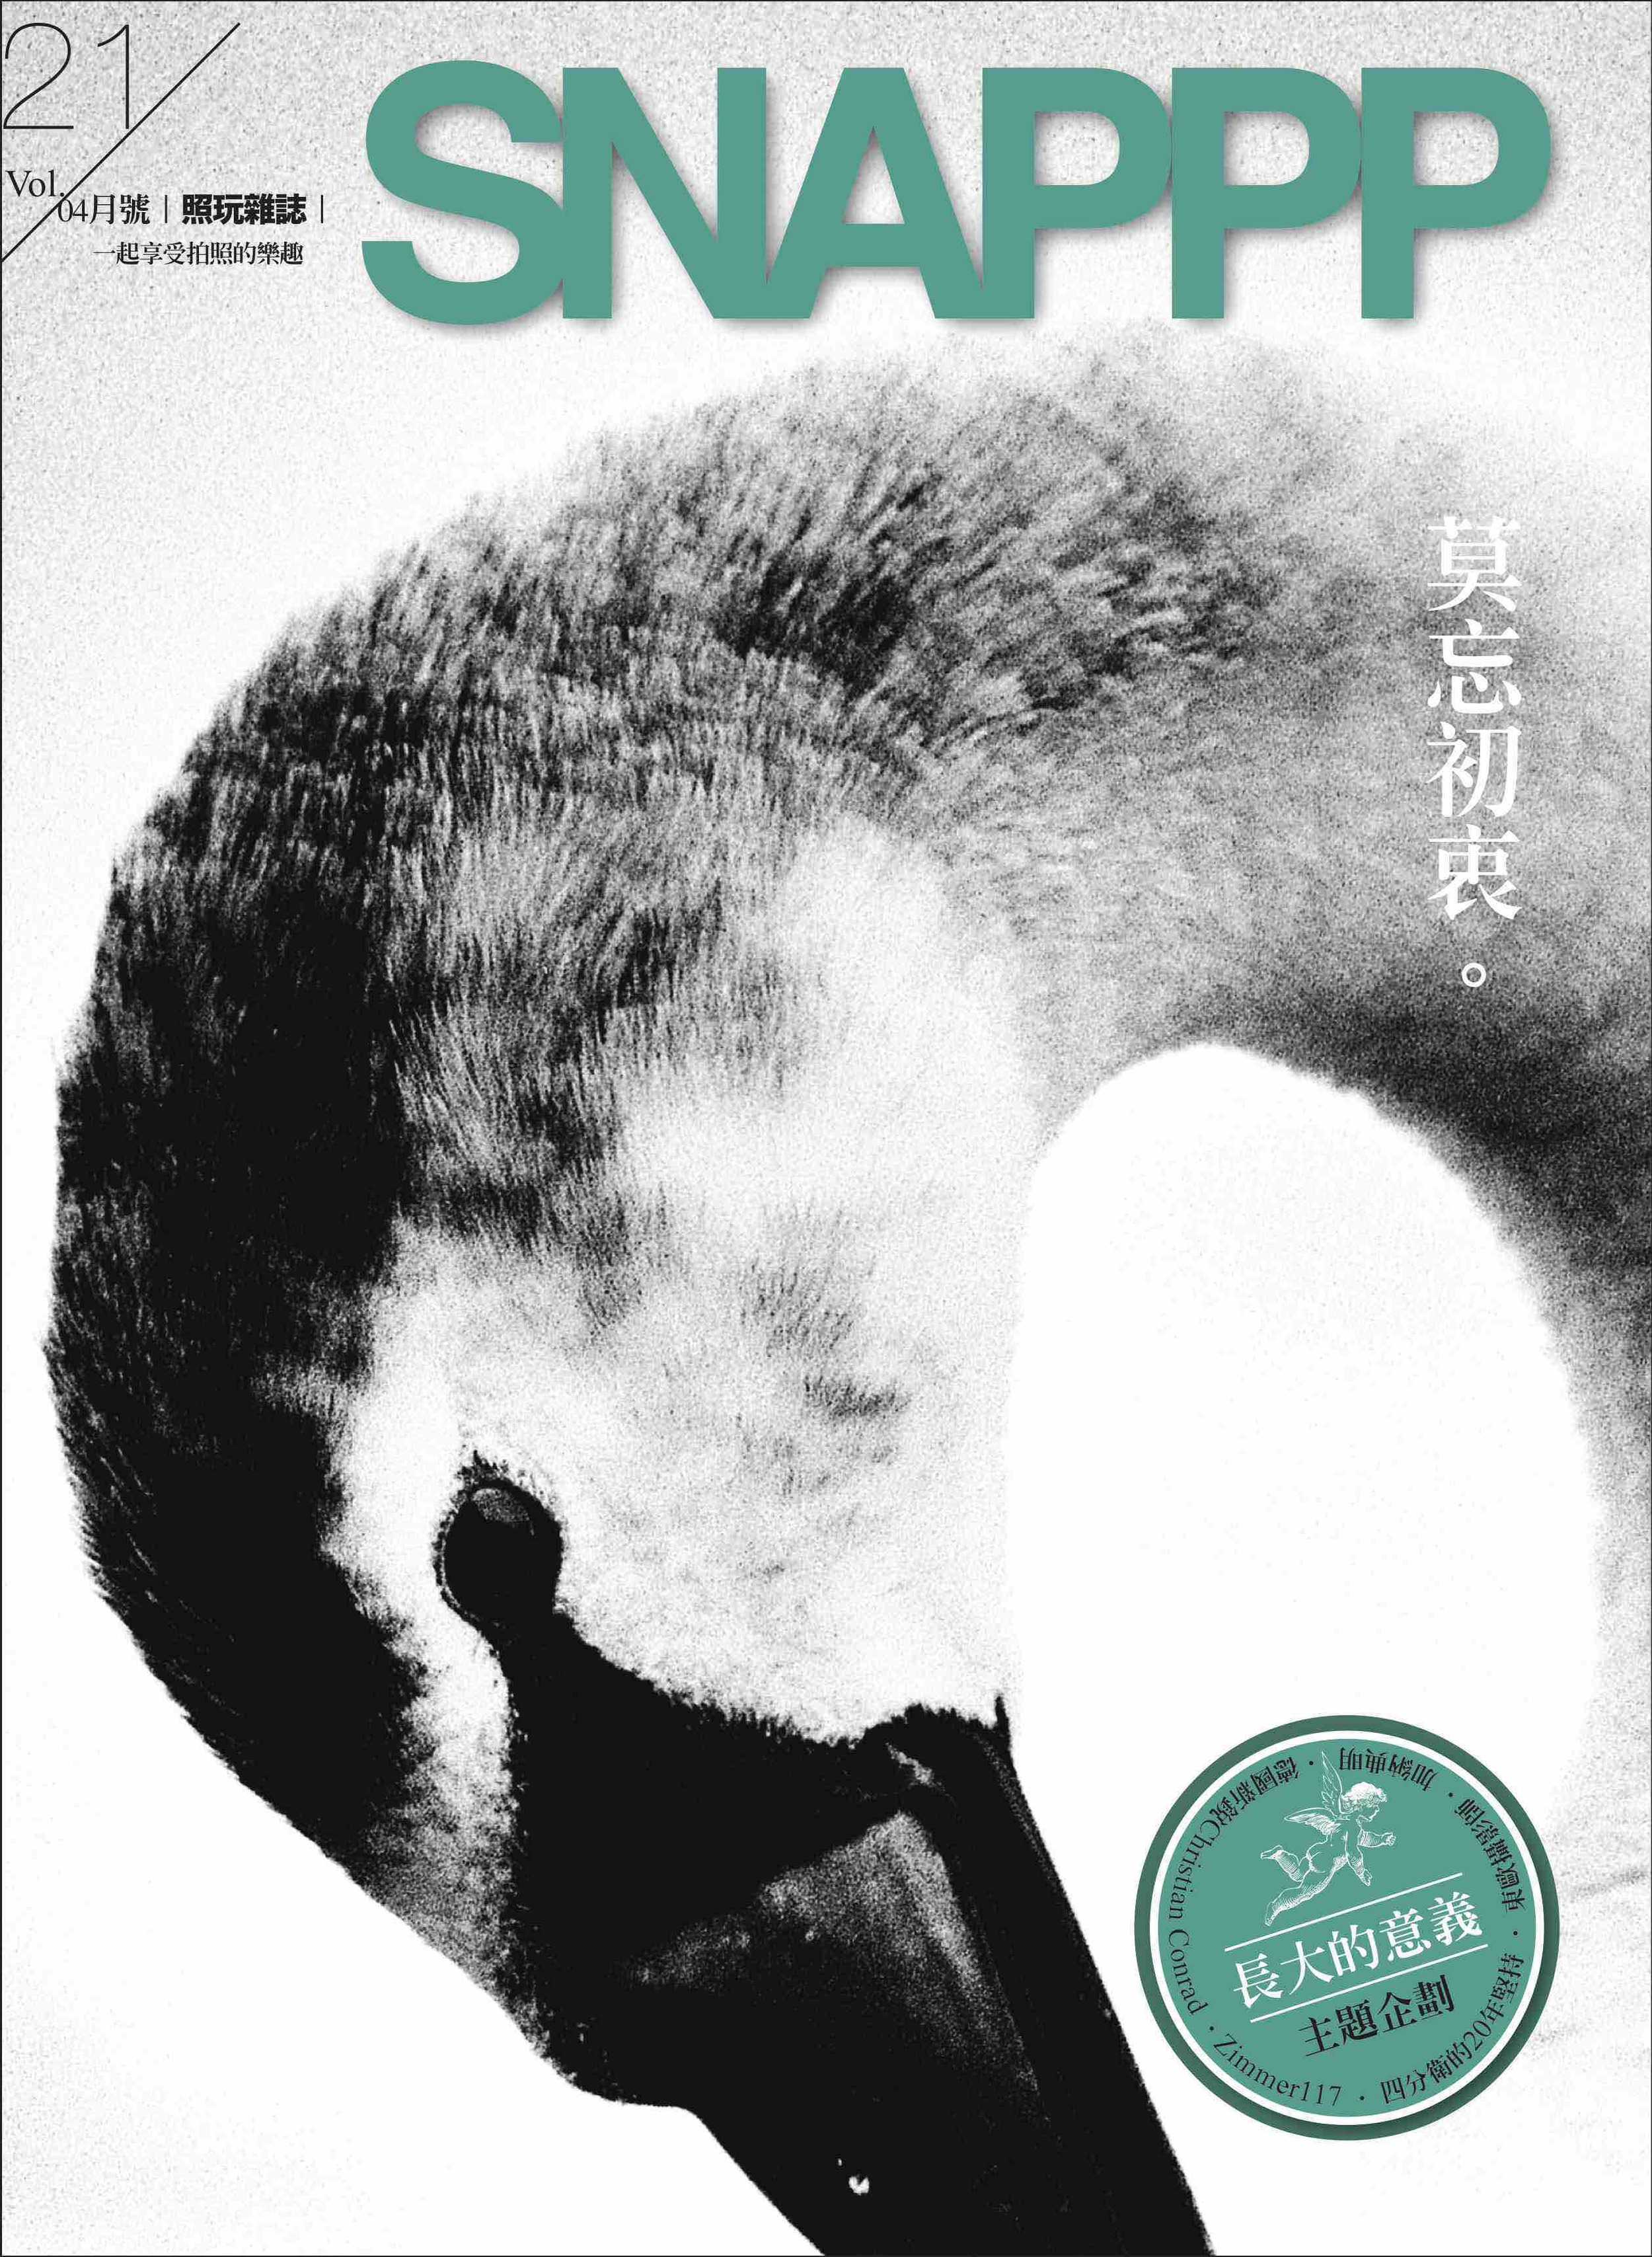 SNAPPP-NO21 COVER-ver1.jpg